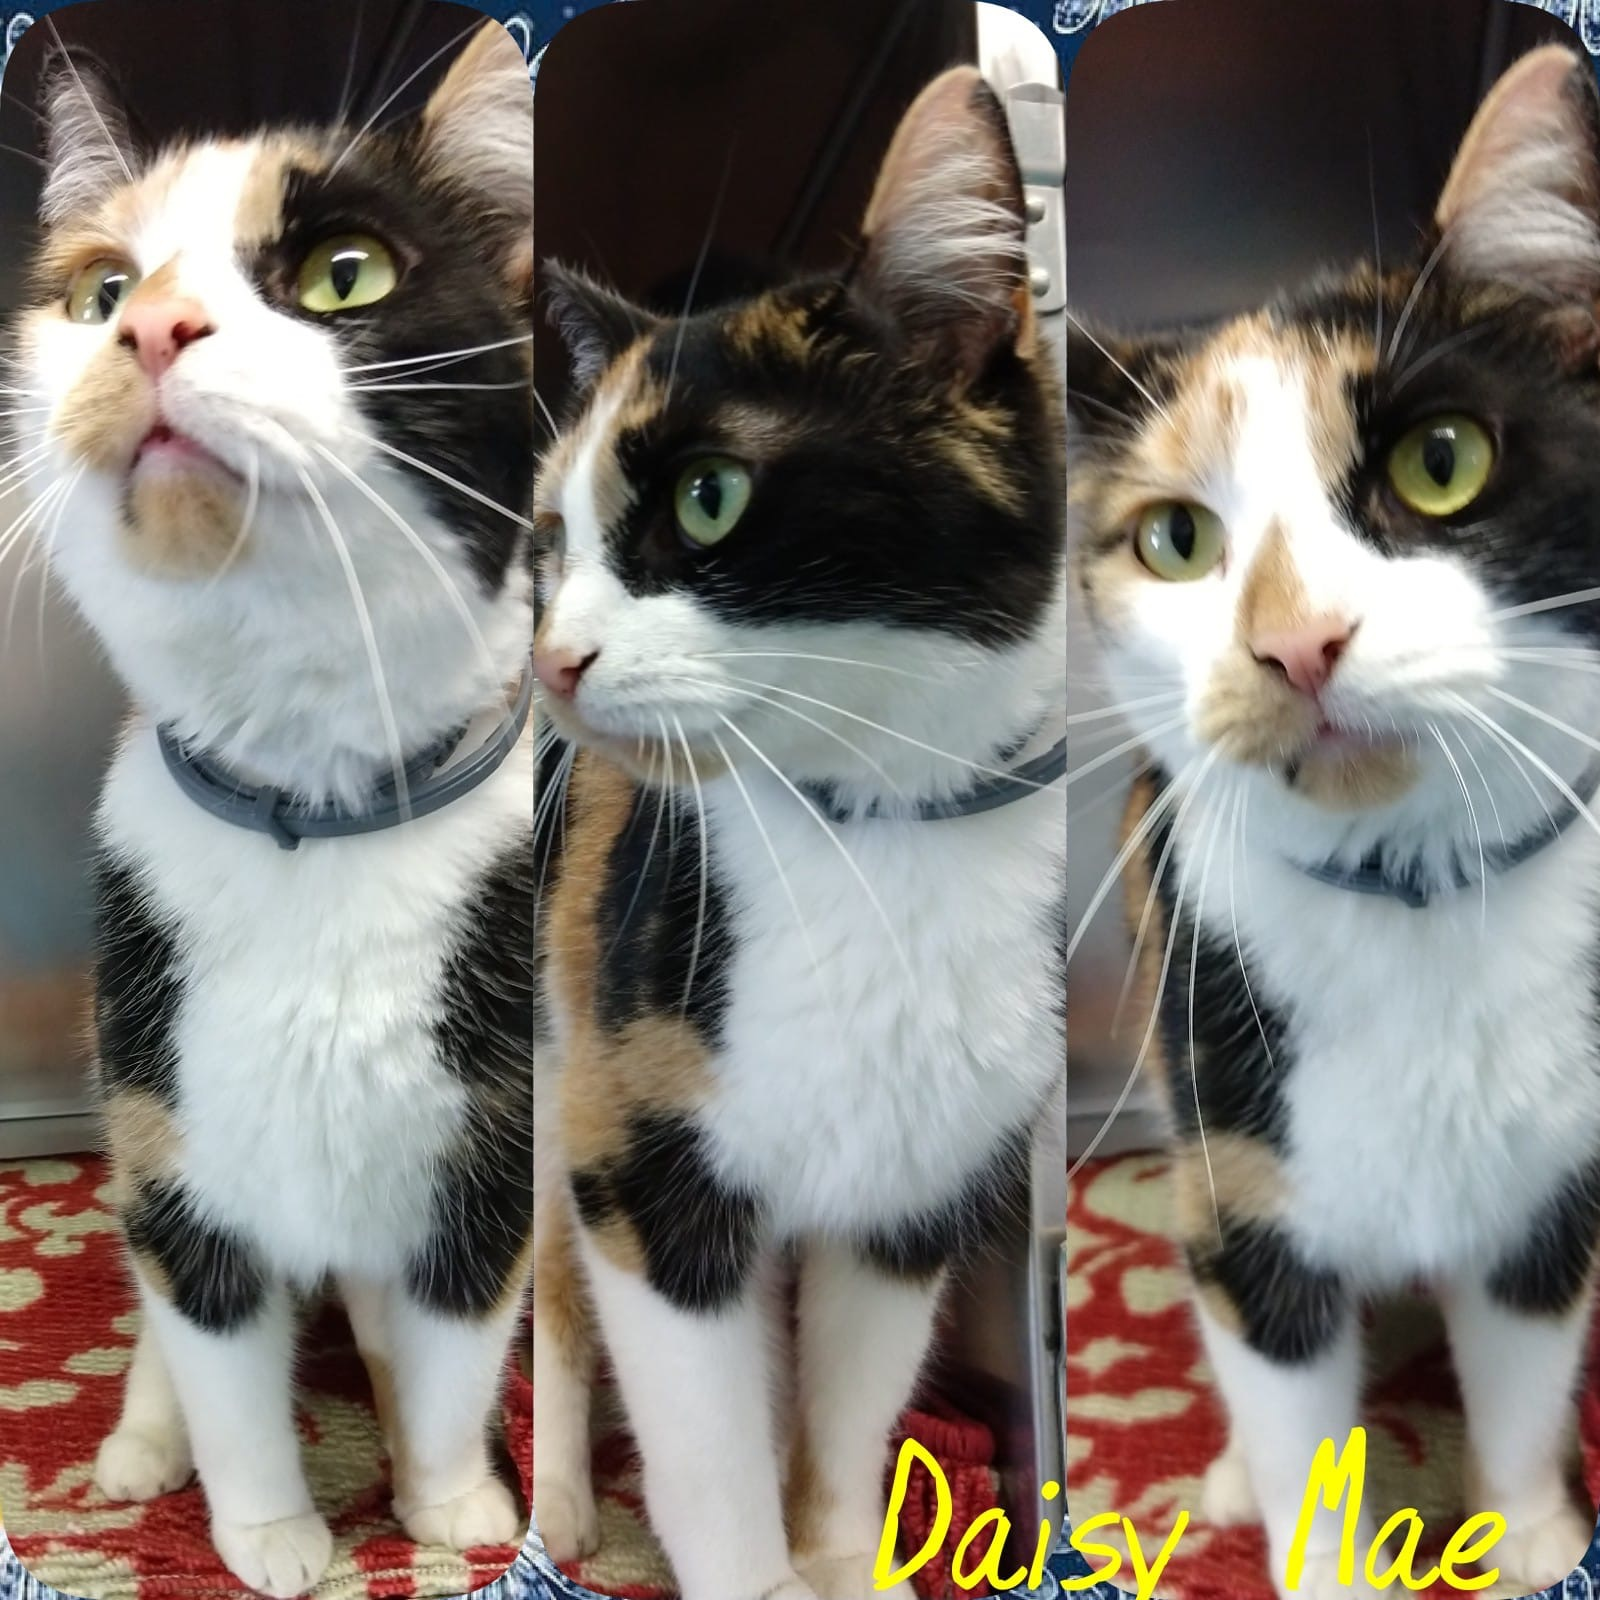 Daisy Mae - Domestic Short Hair